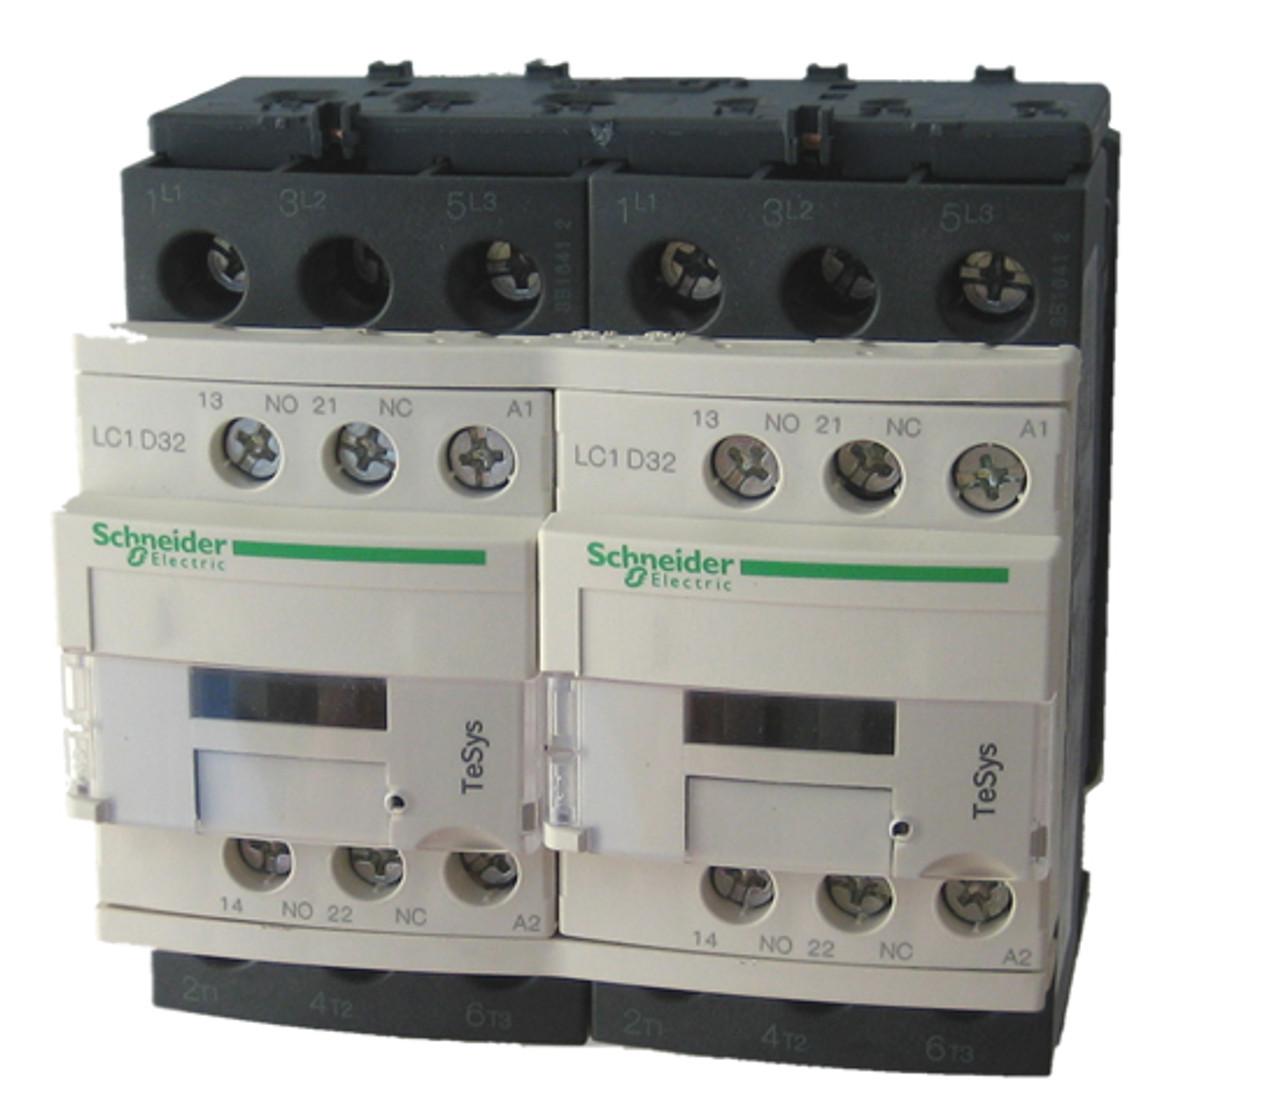 Schneider Electric LC2D32X7 reversing contactor